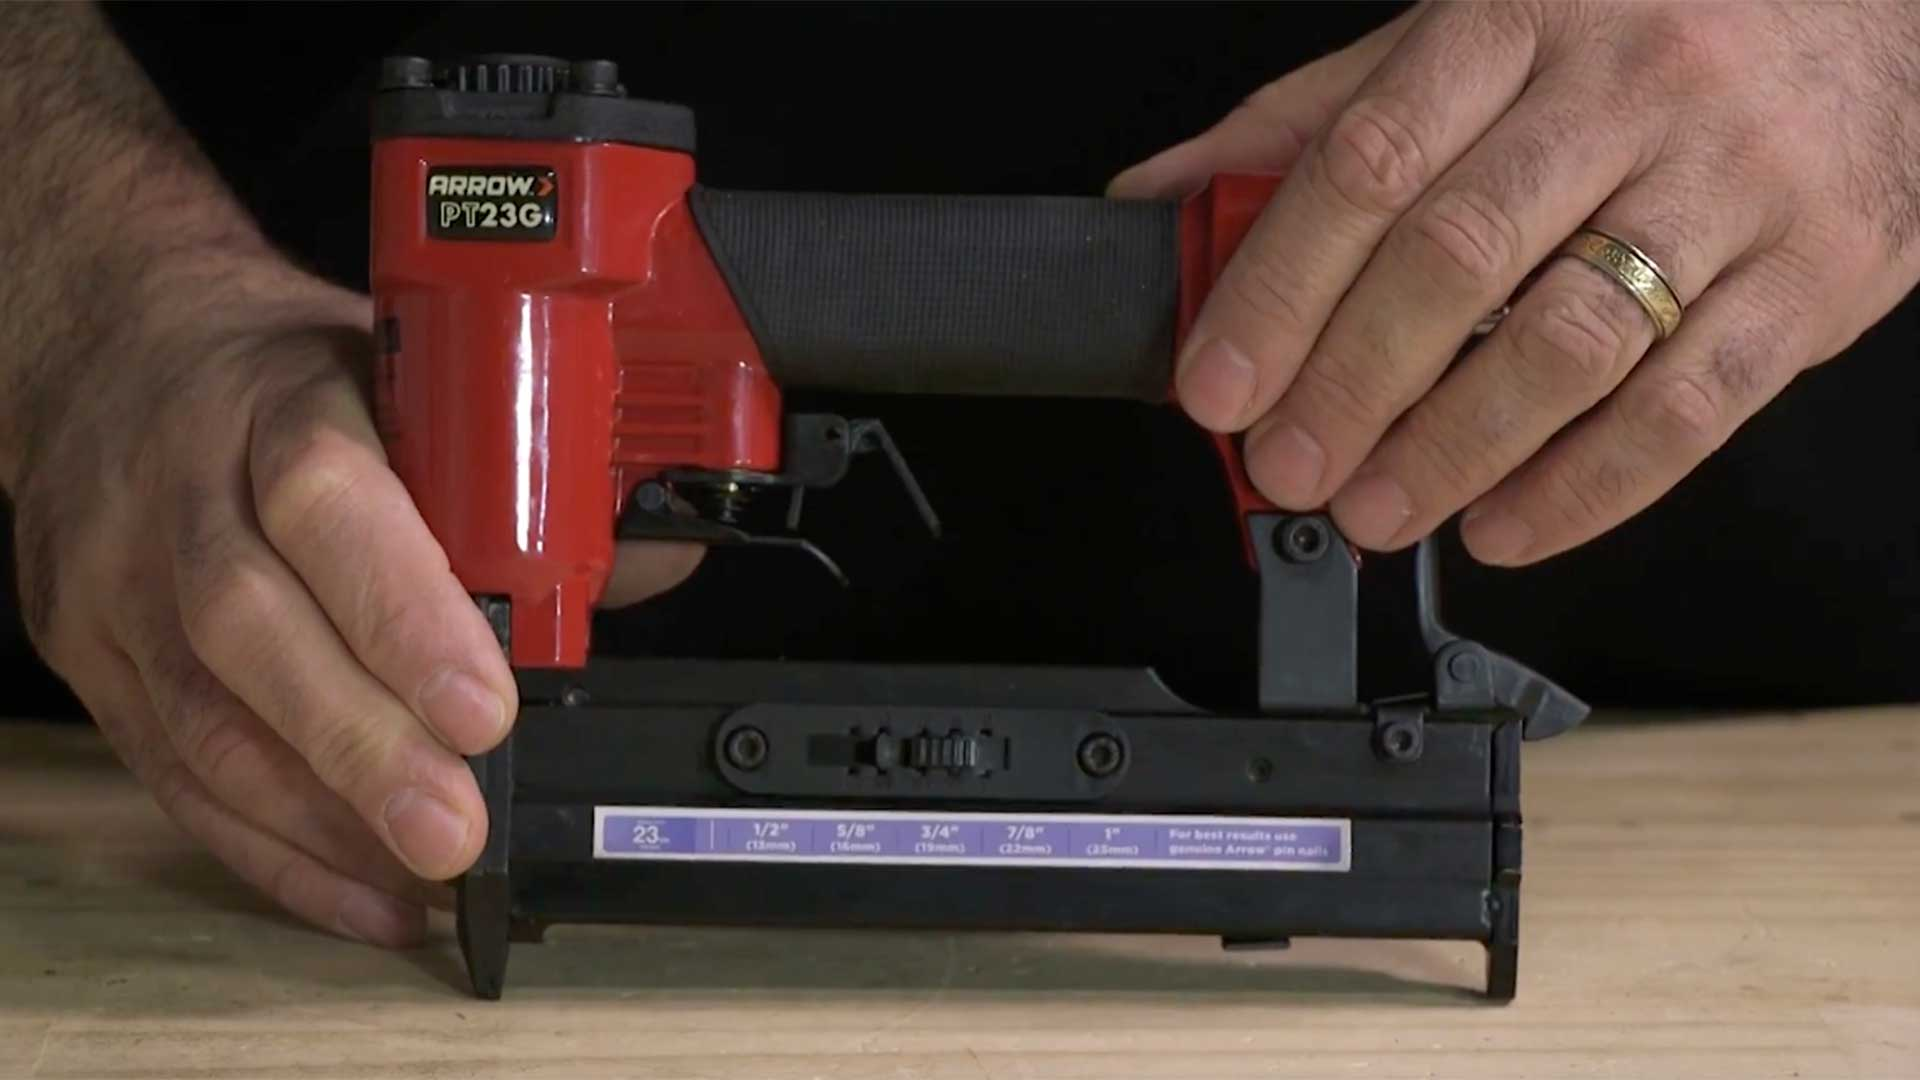 PT23G Pneumatic Pin Nail Gun